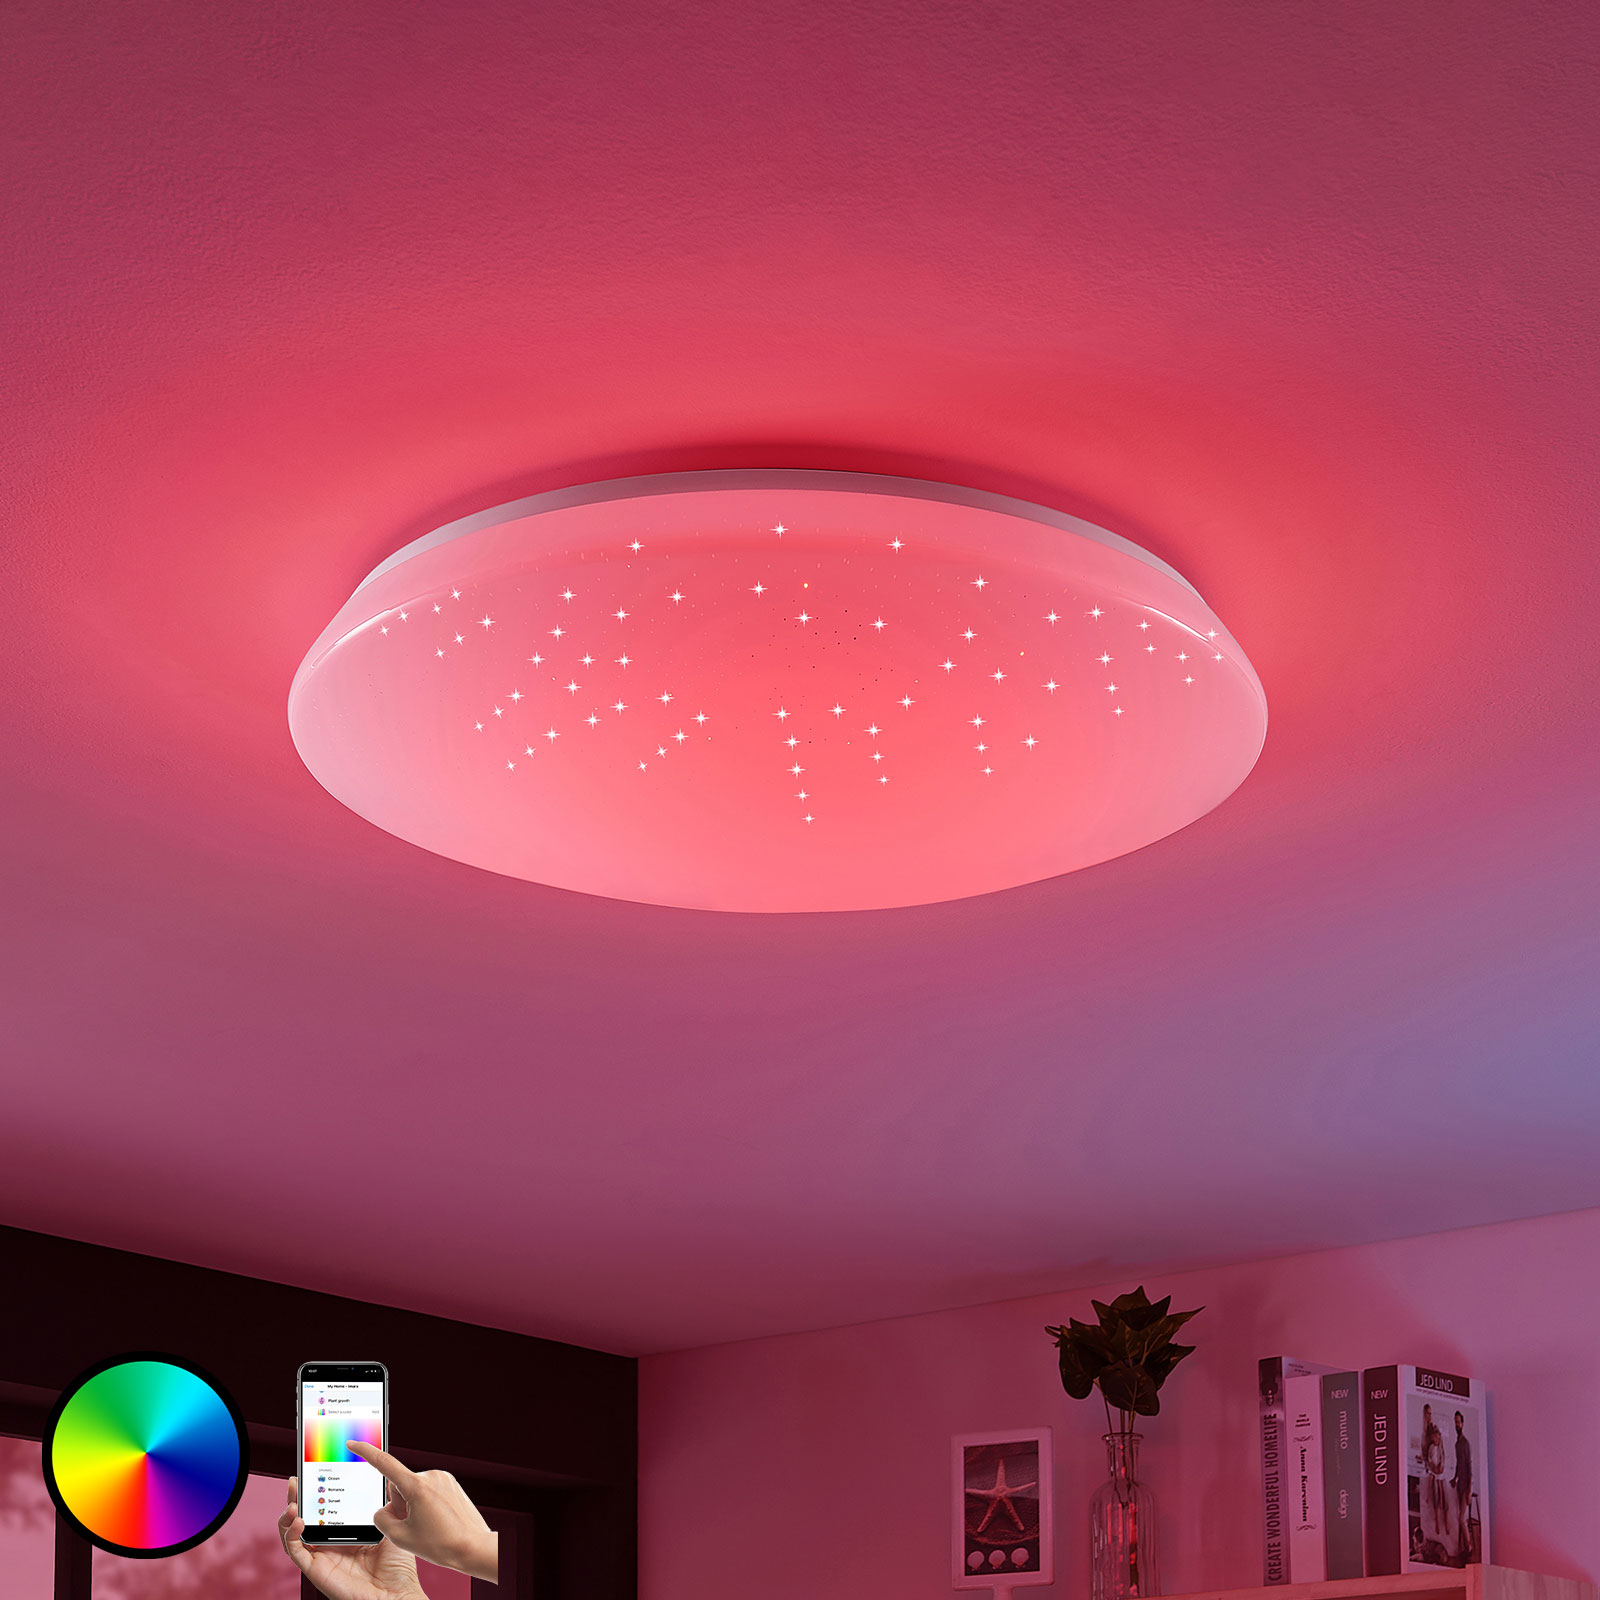 LED-taklampe Jelka, WiZ, RGBW-fargeveksel, rund